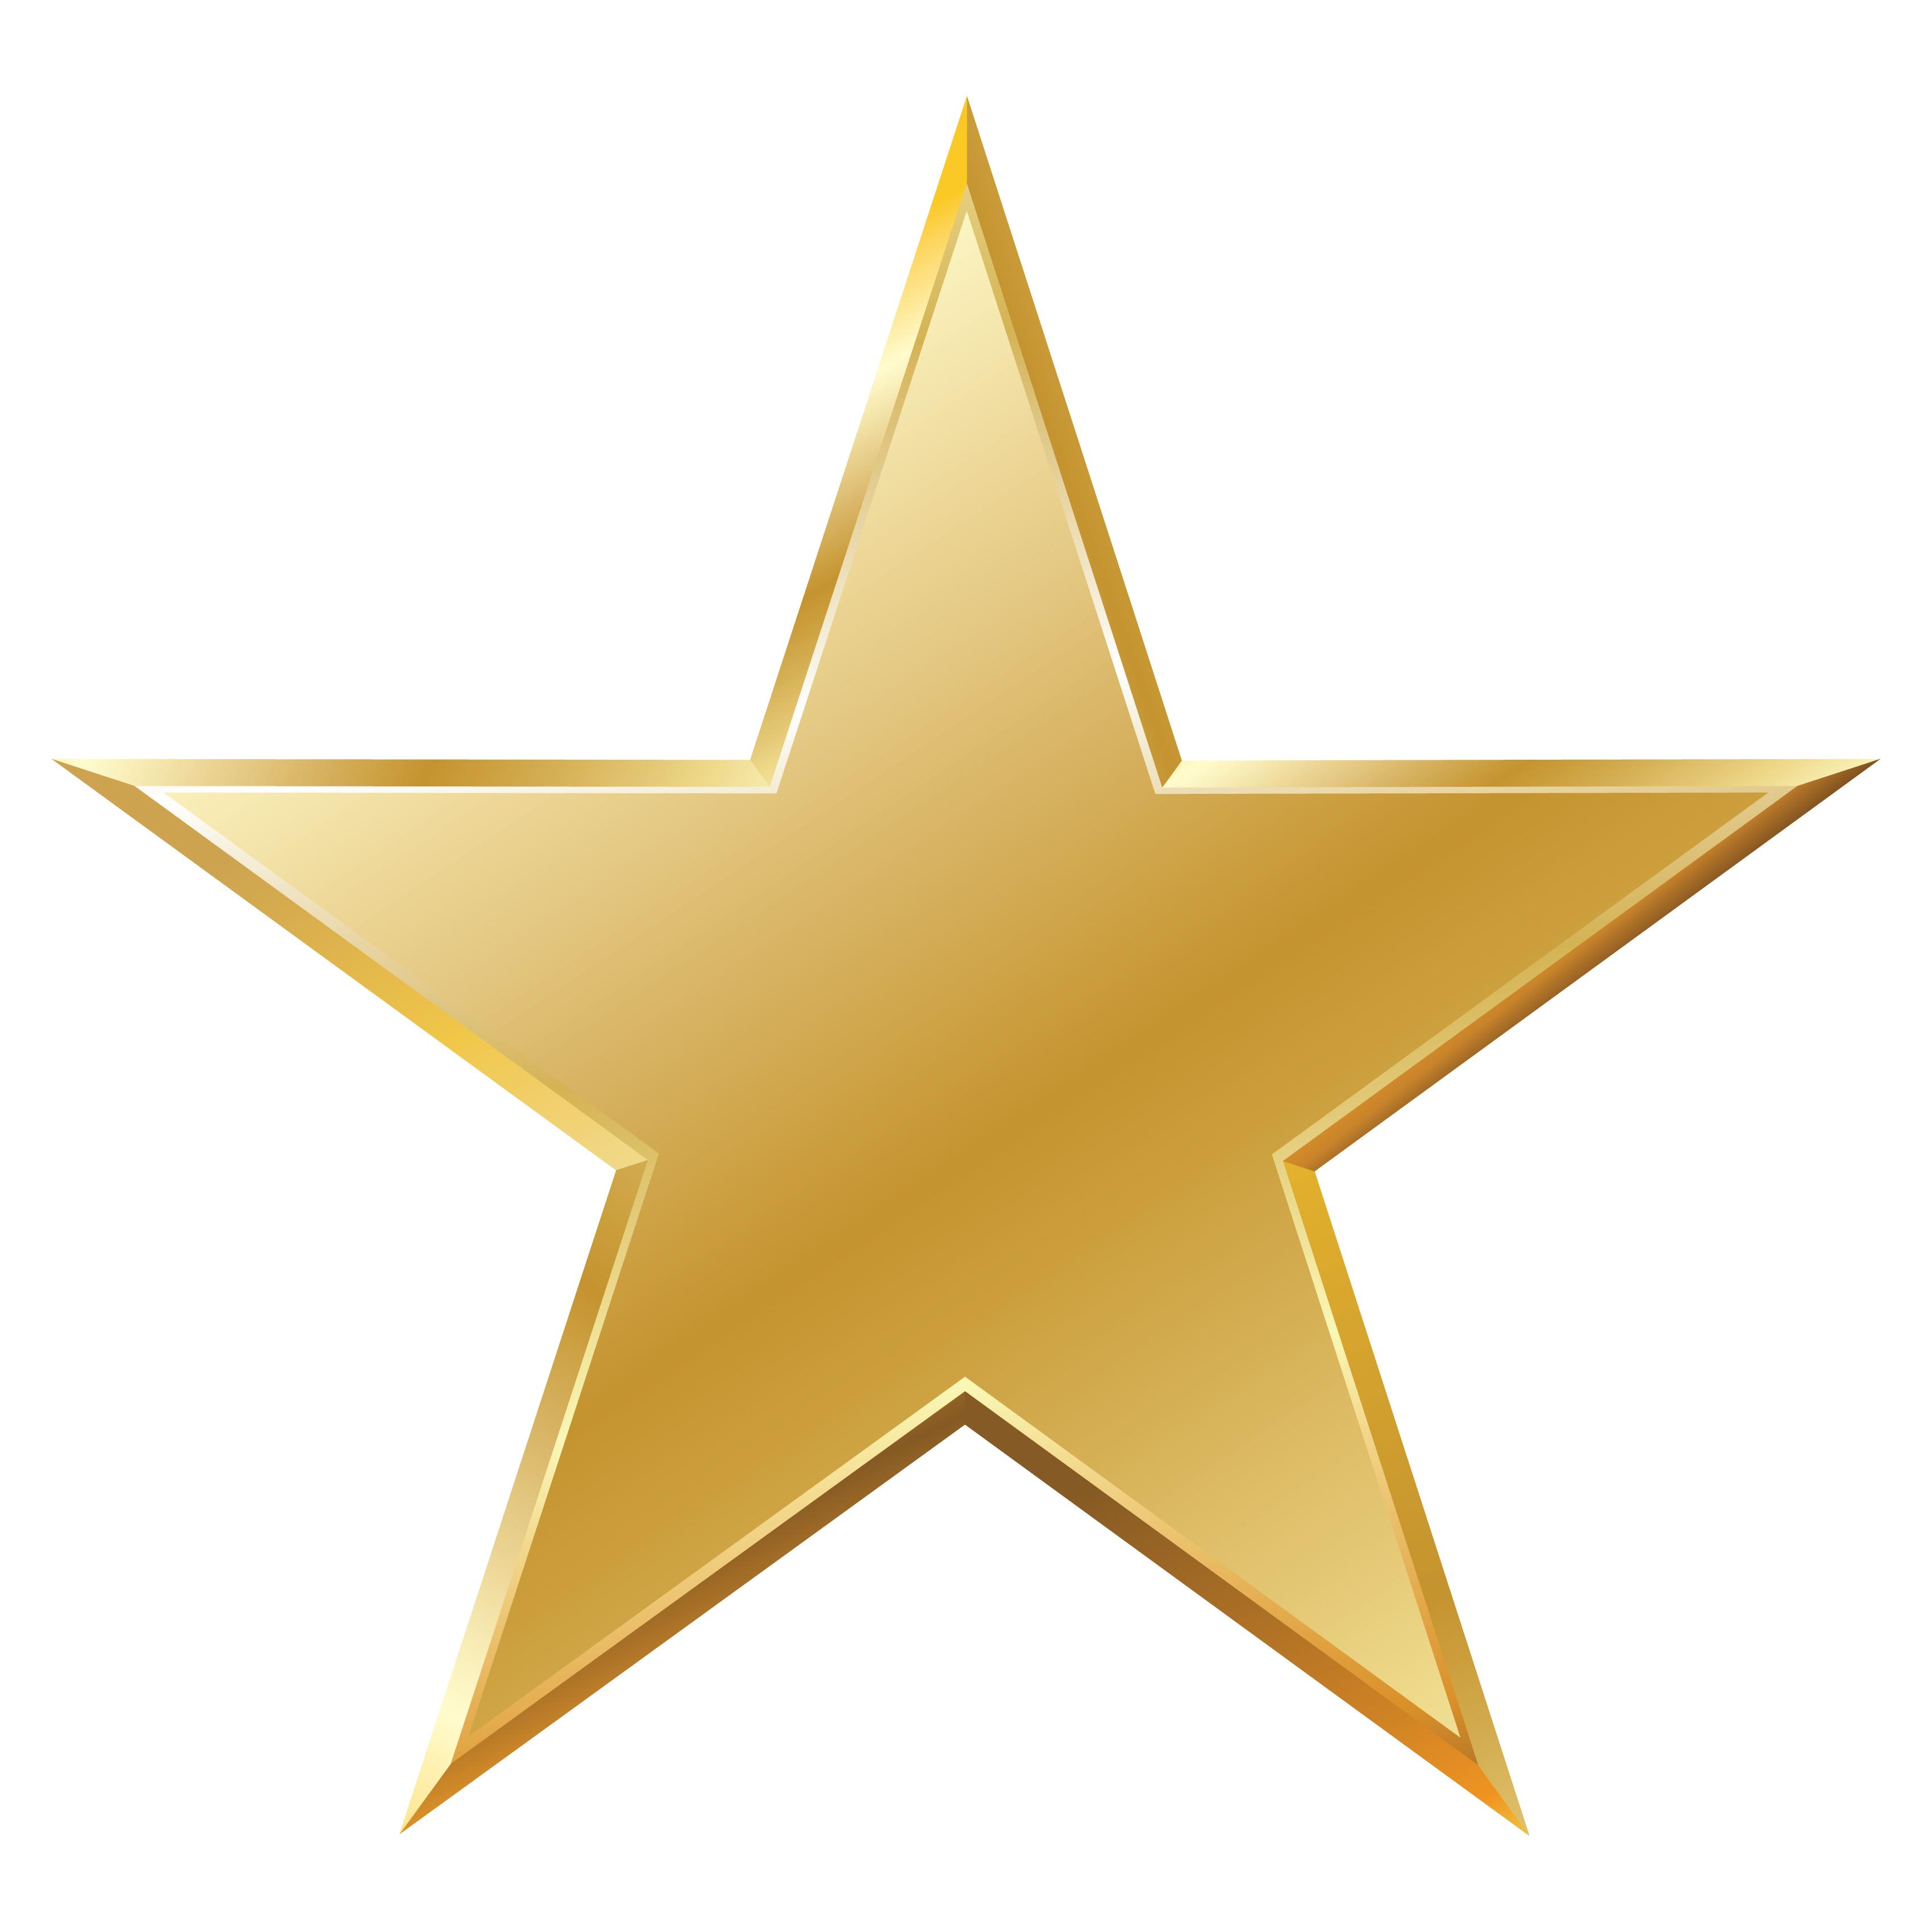 Gold-star-clipart-2-1511118750.jpg